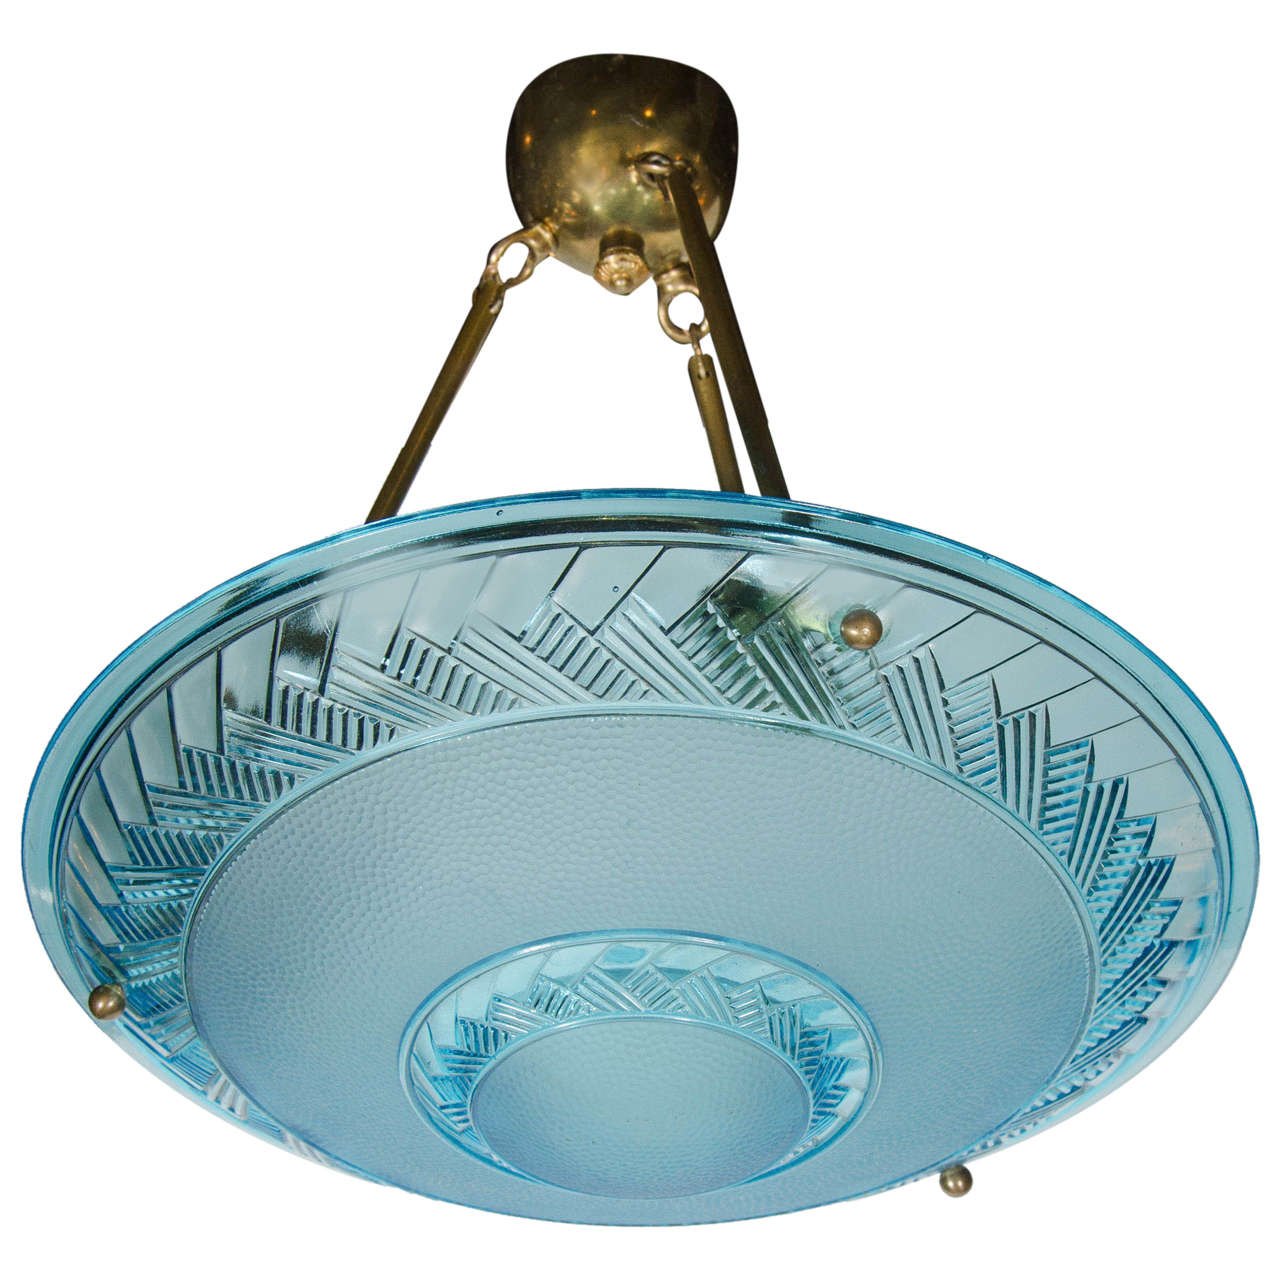 Art deco flush mount chandelier in blue glass by degue at 1stdibs art deco flush mount chandelier in blue glass by degue 1 arubaitofo Choice Image